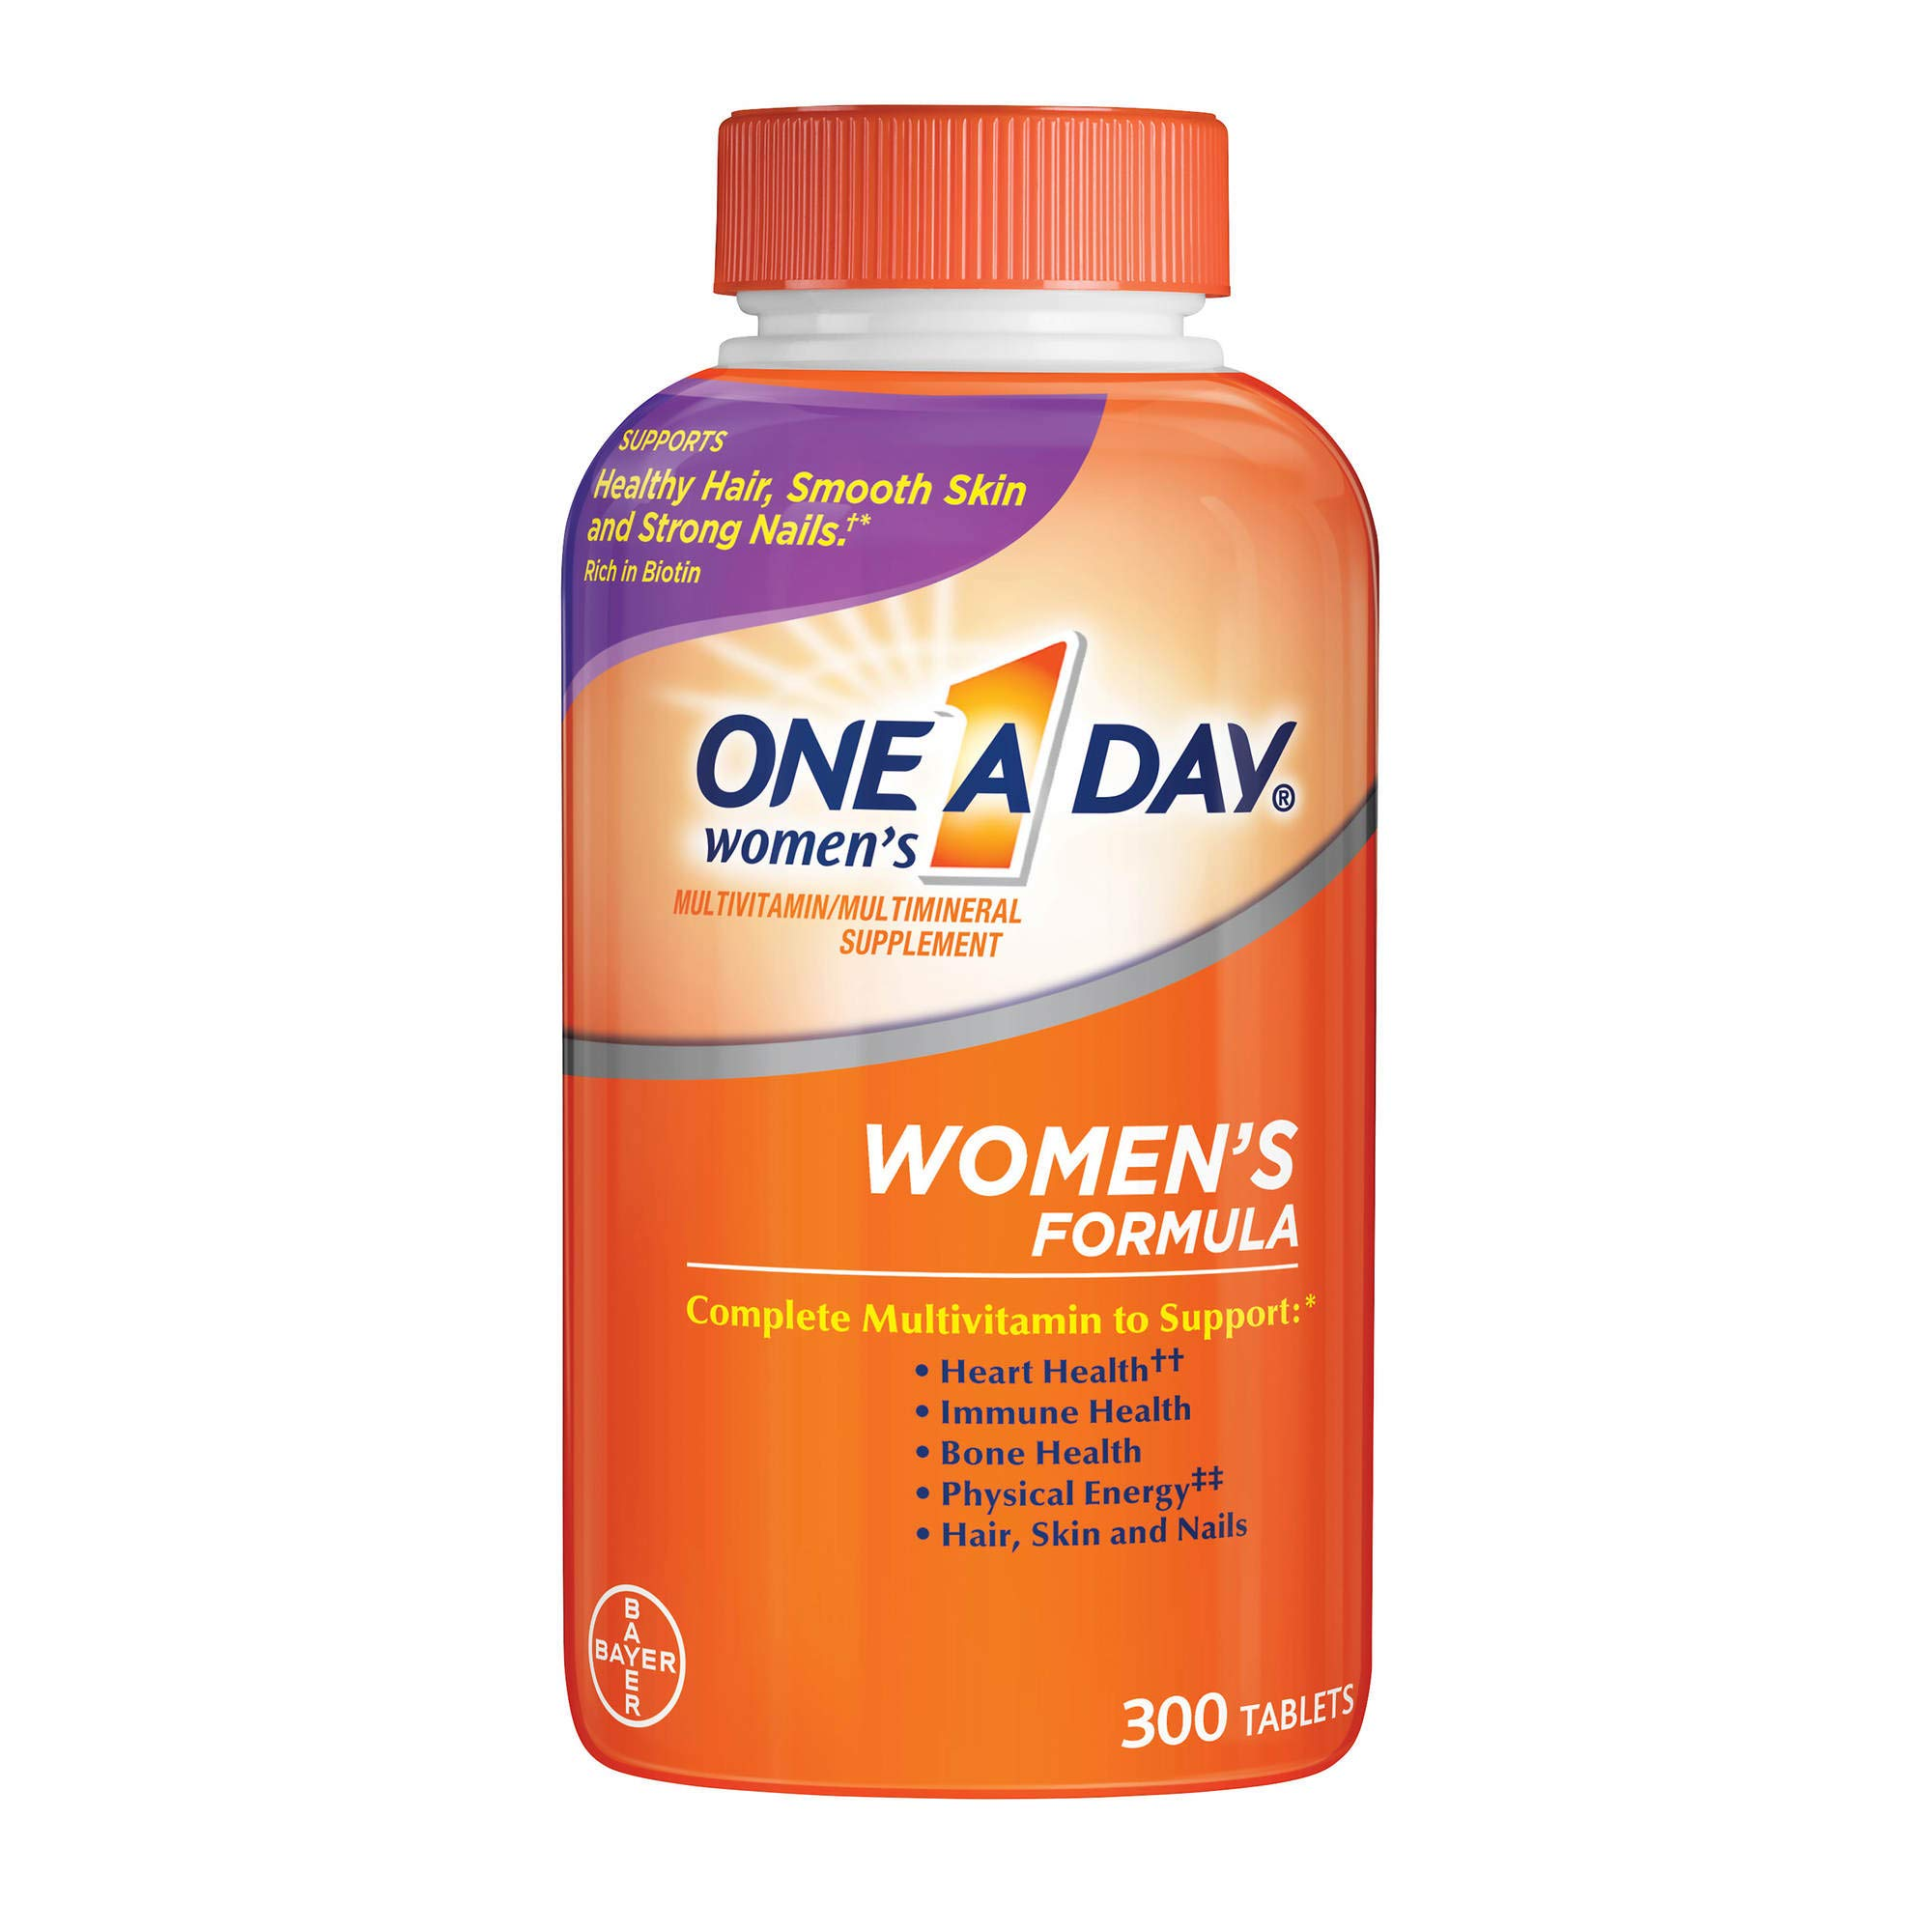 One-a-Day Women's Formula Complete Multivitamin 300 Tablets Bone Health Skin Health